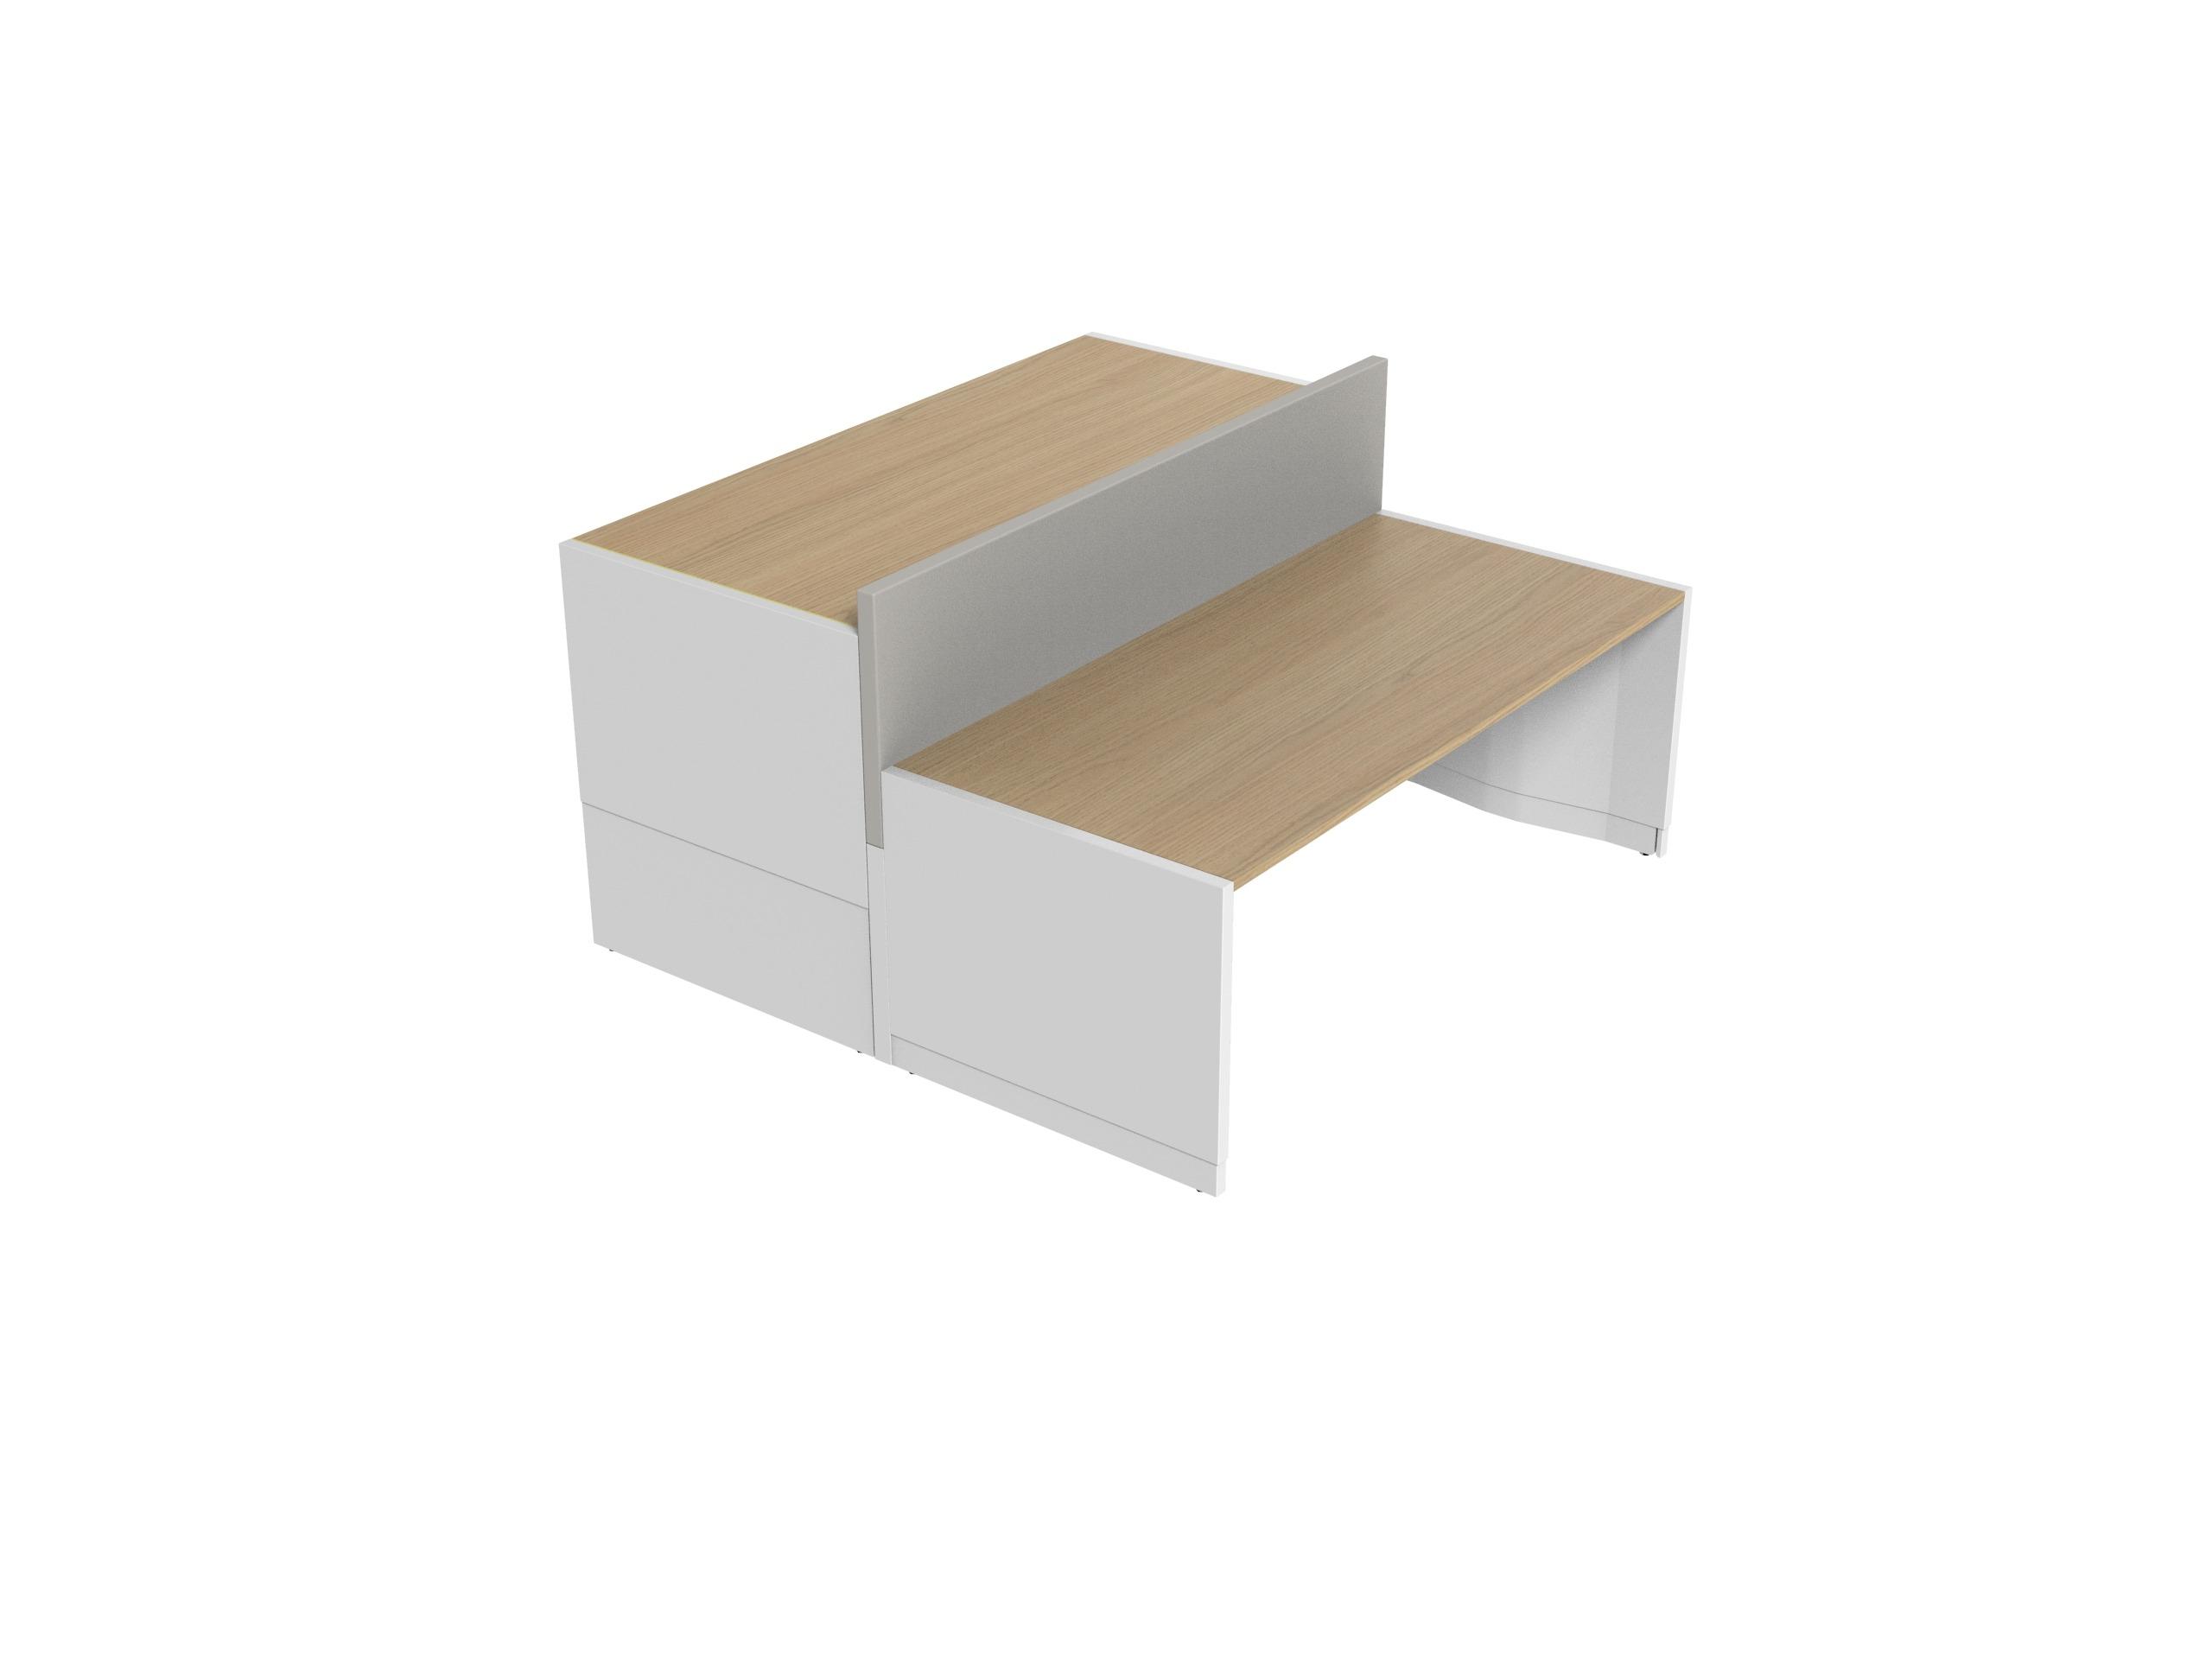 Mooze - bench